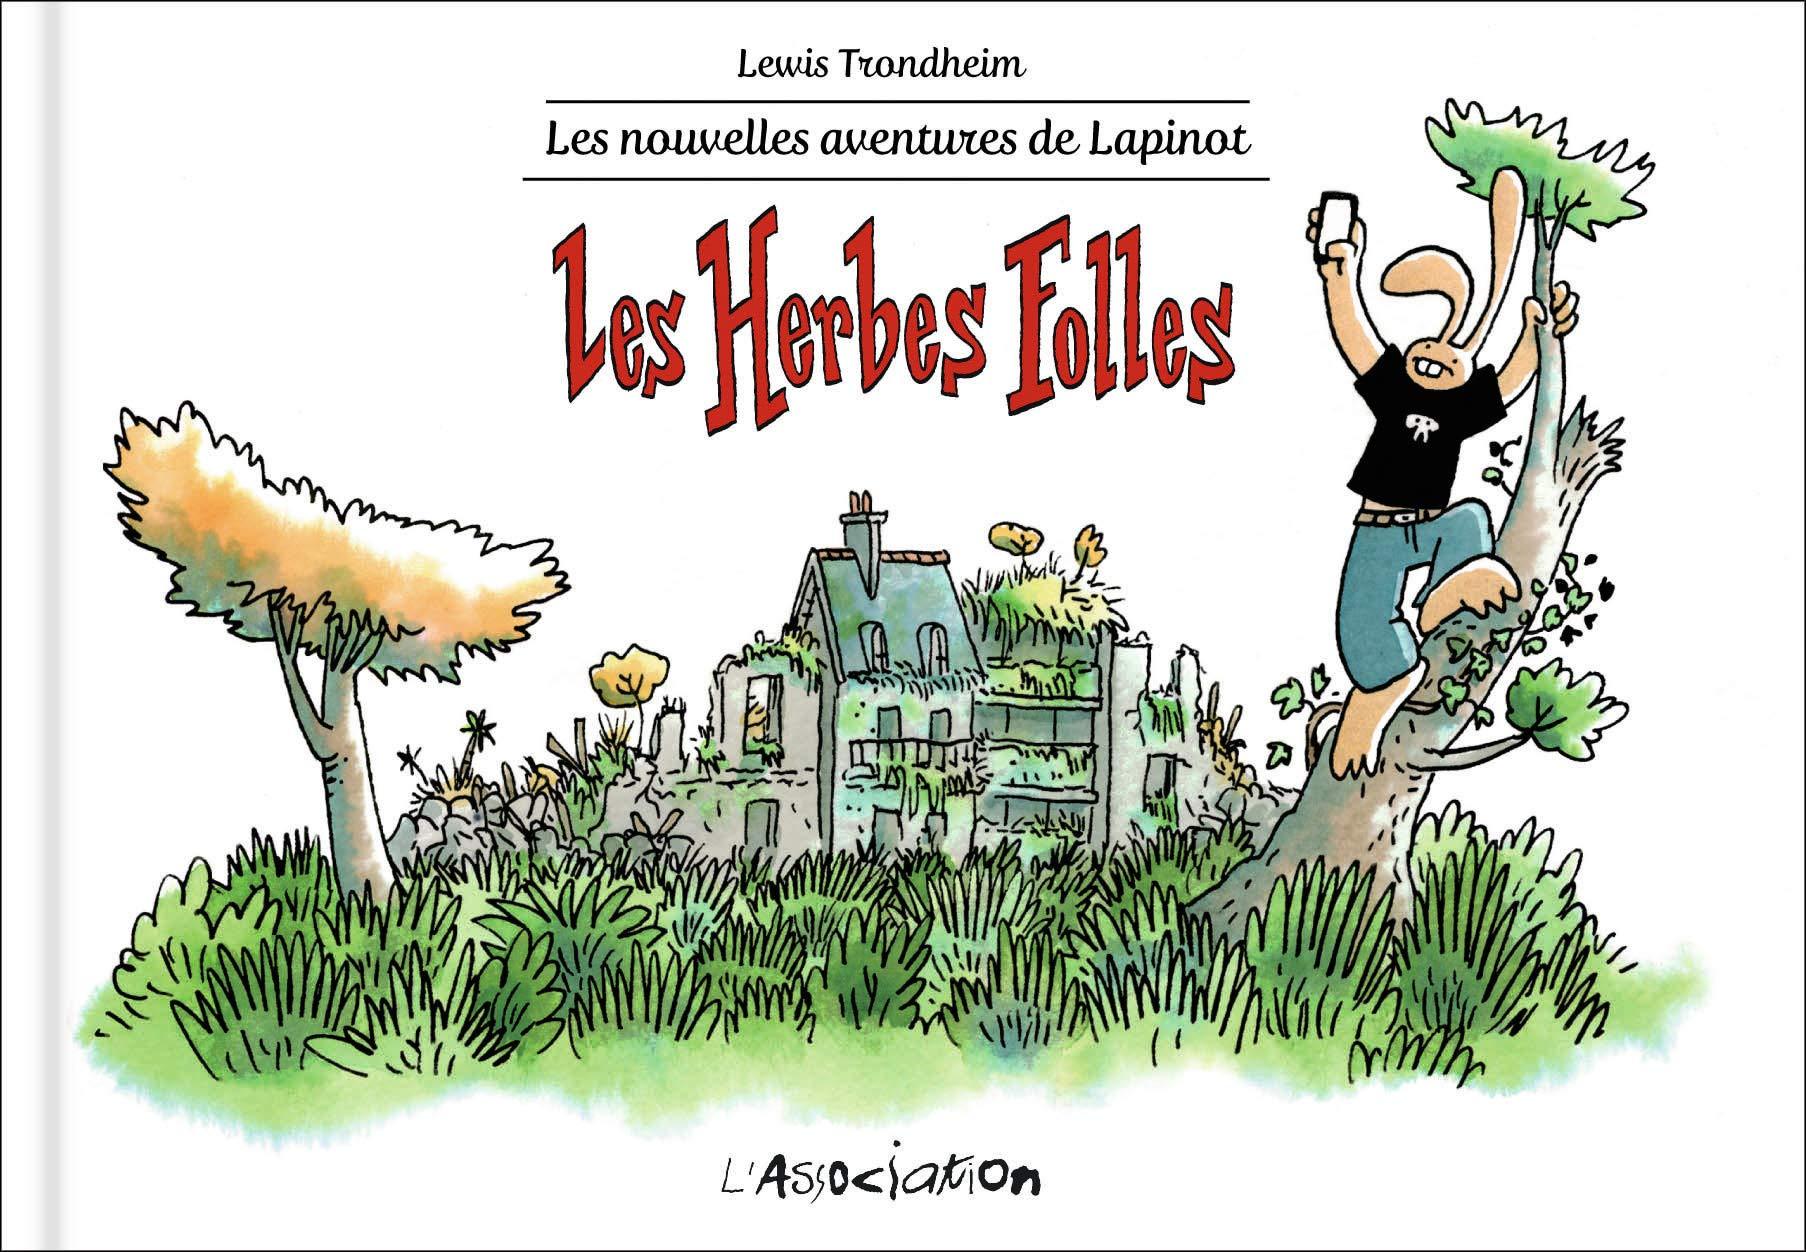 Les Herbes folles: Lapinot T2 por Lewis Trondheim